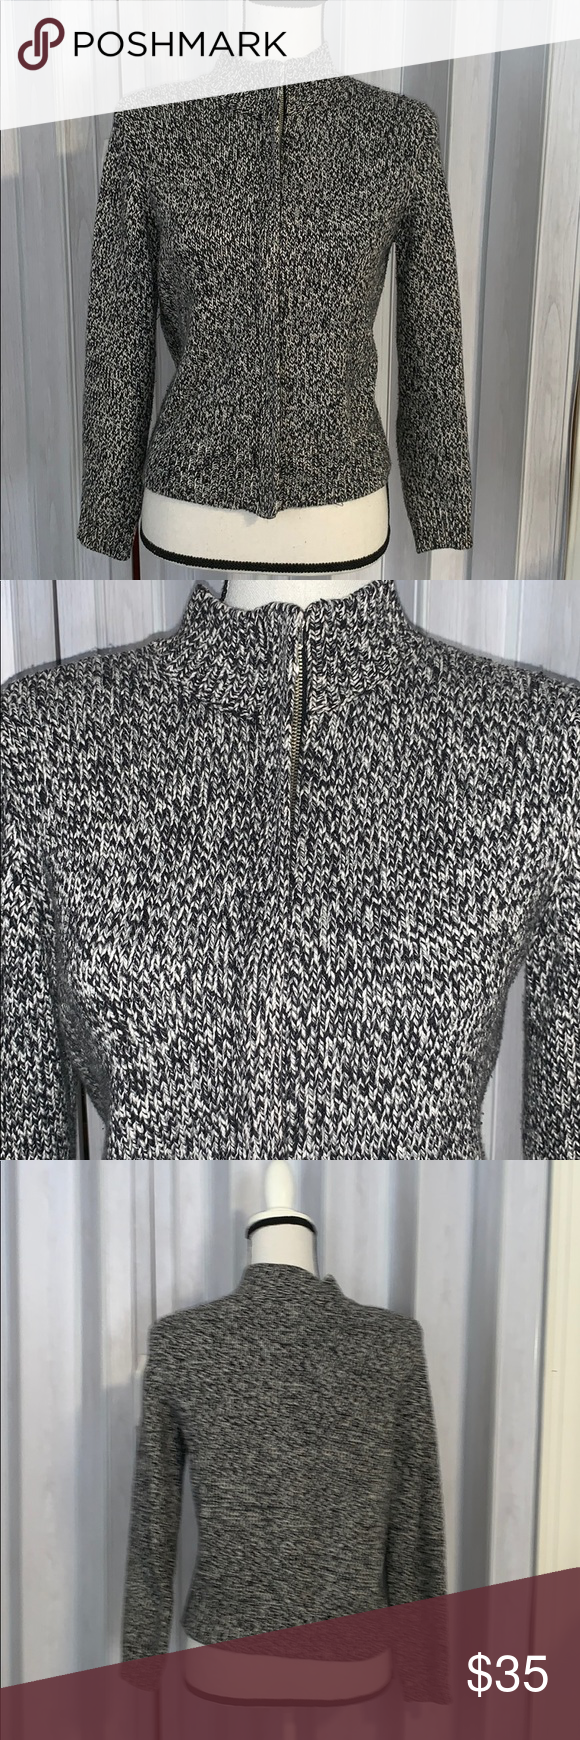 c9f68b9179 Petite sophisticate Small petite Made in United Kingdom Petite Sophisticate  Sweaters Cardigans